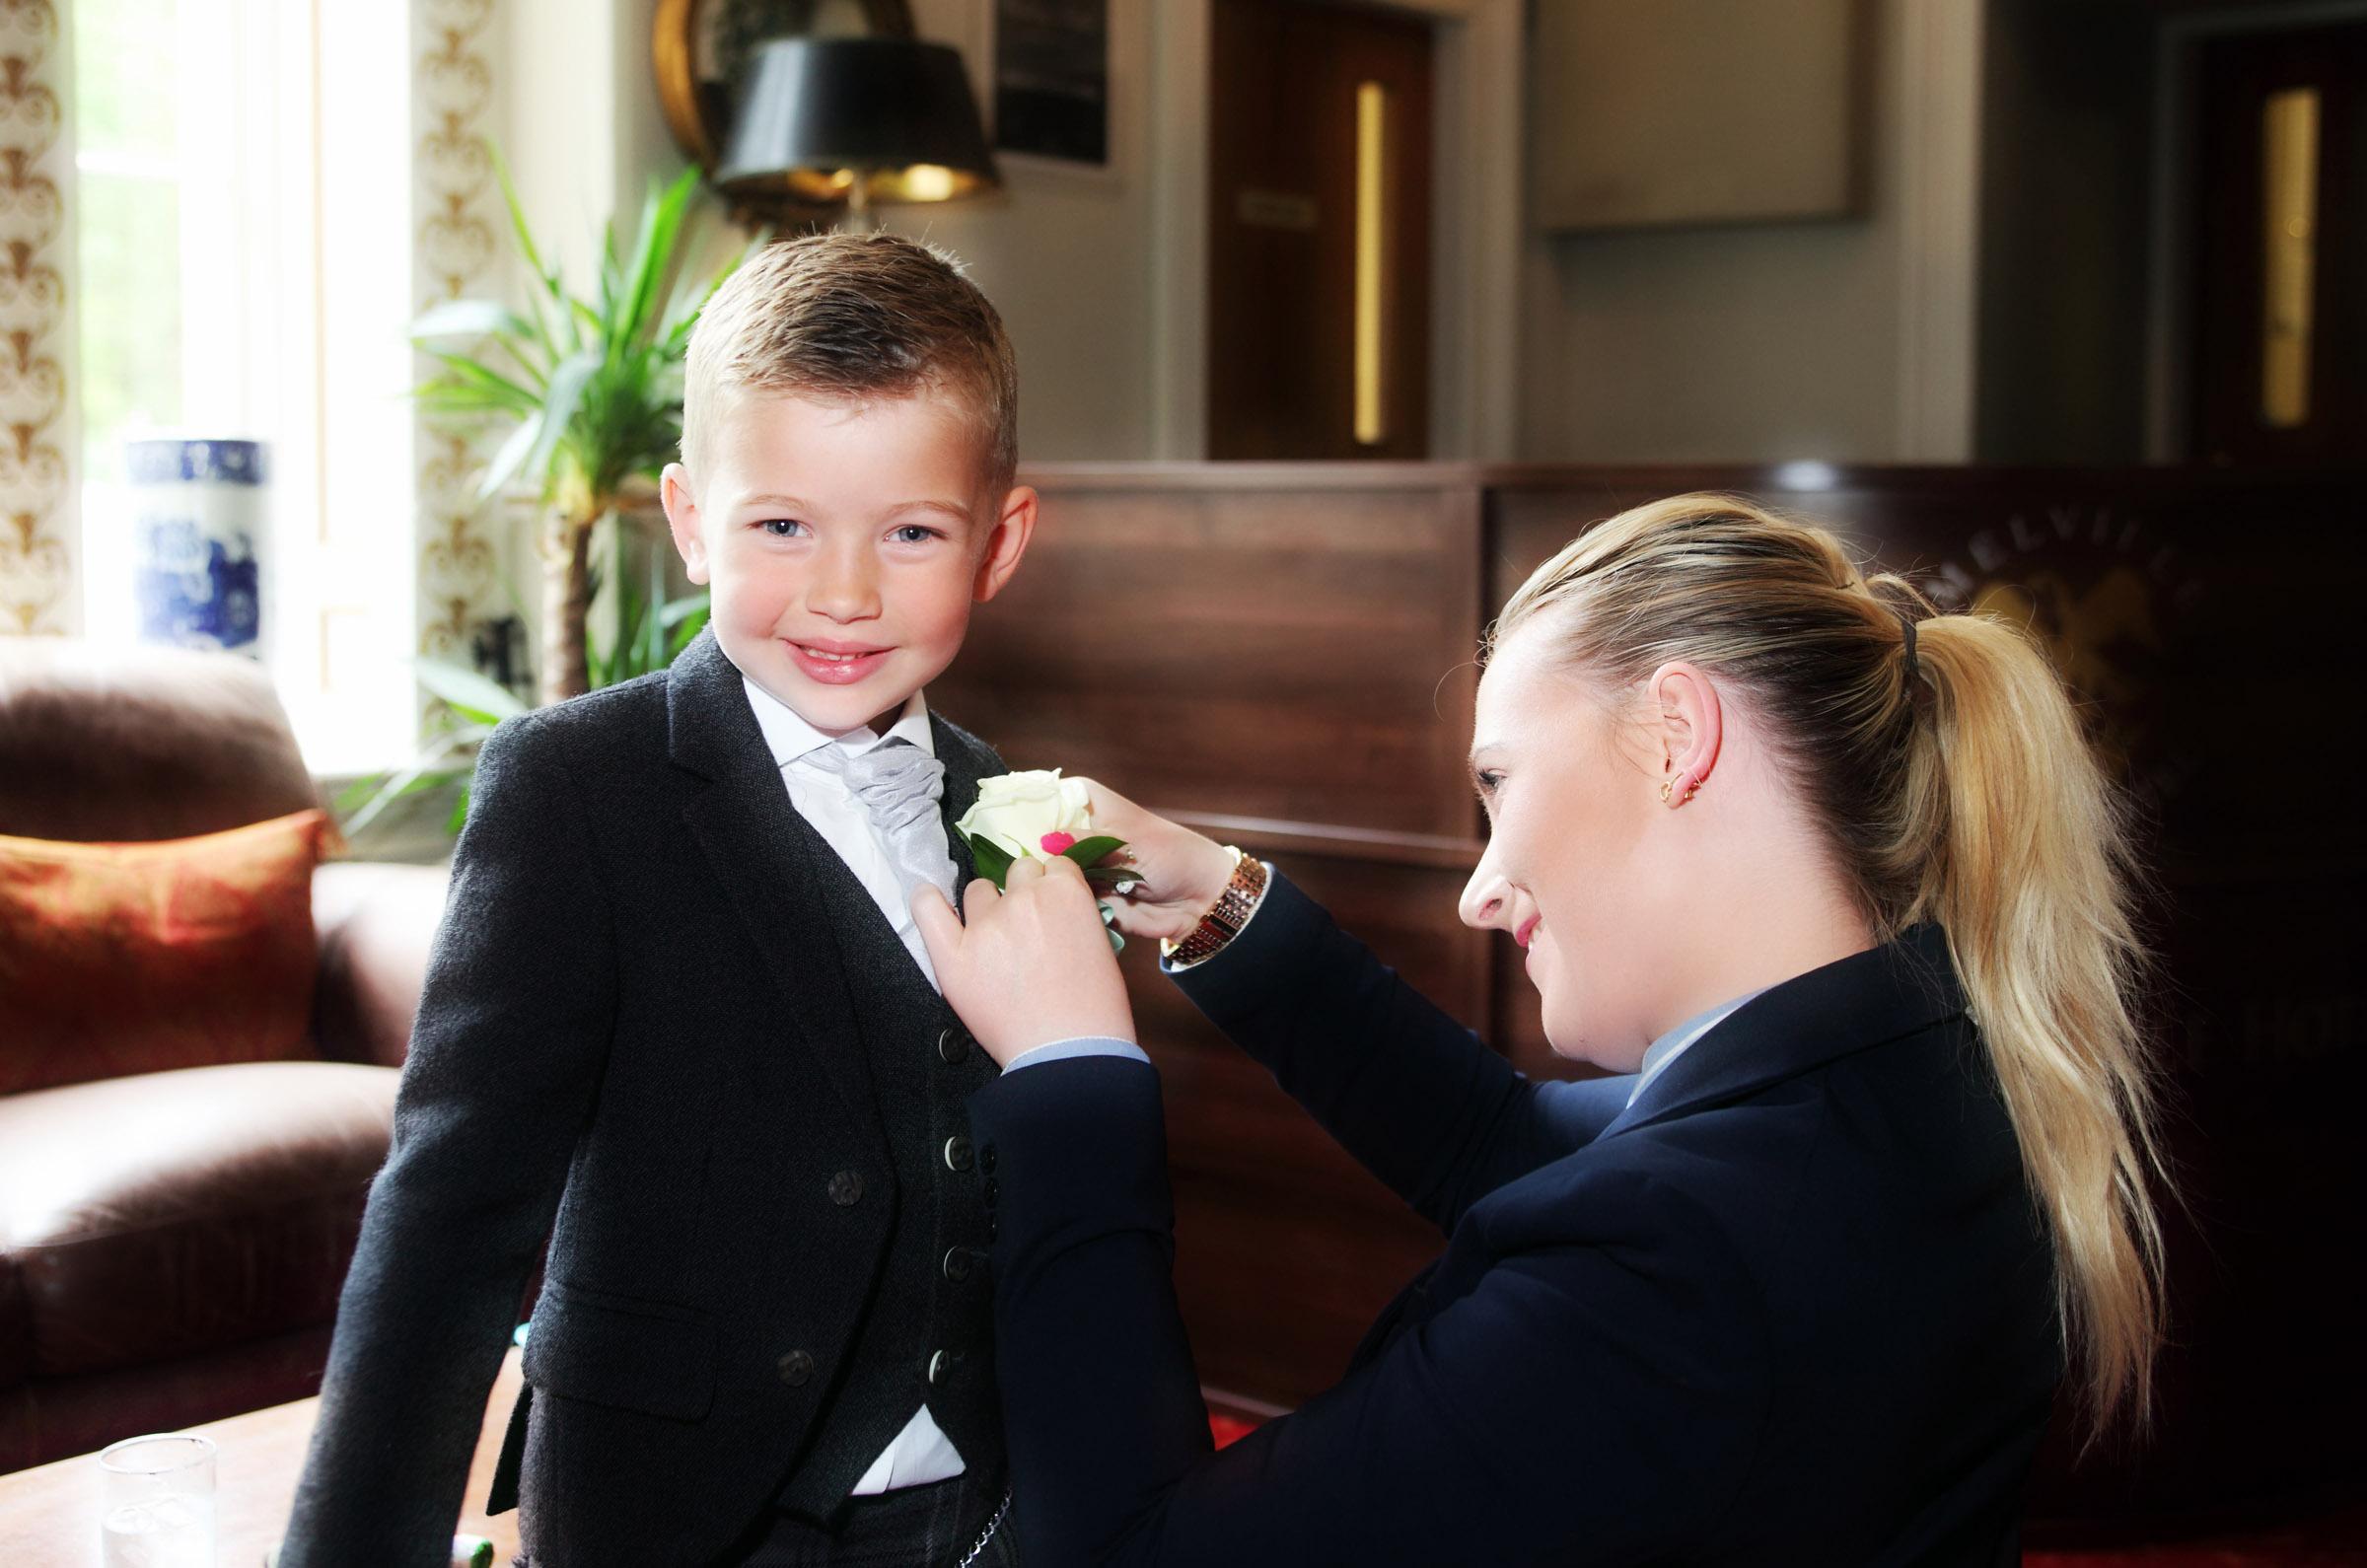 Page_Boy_with wedding photographer Edinburgh.jpg